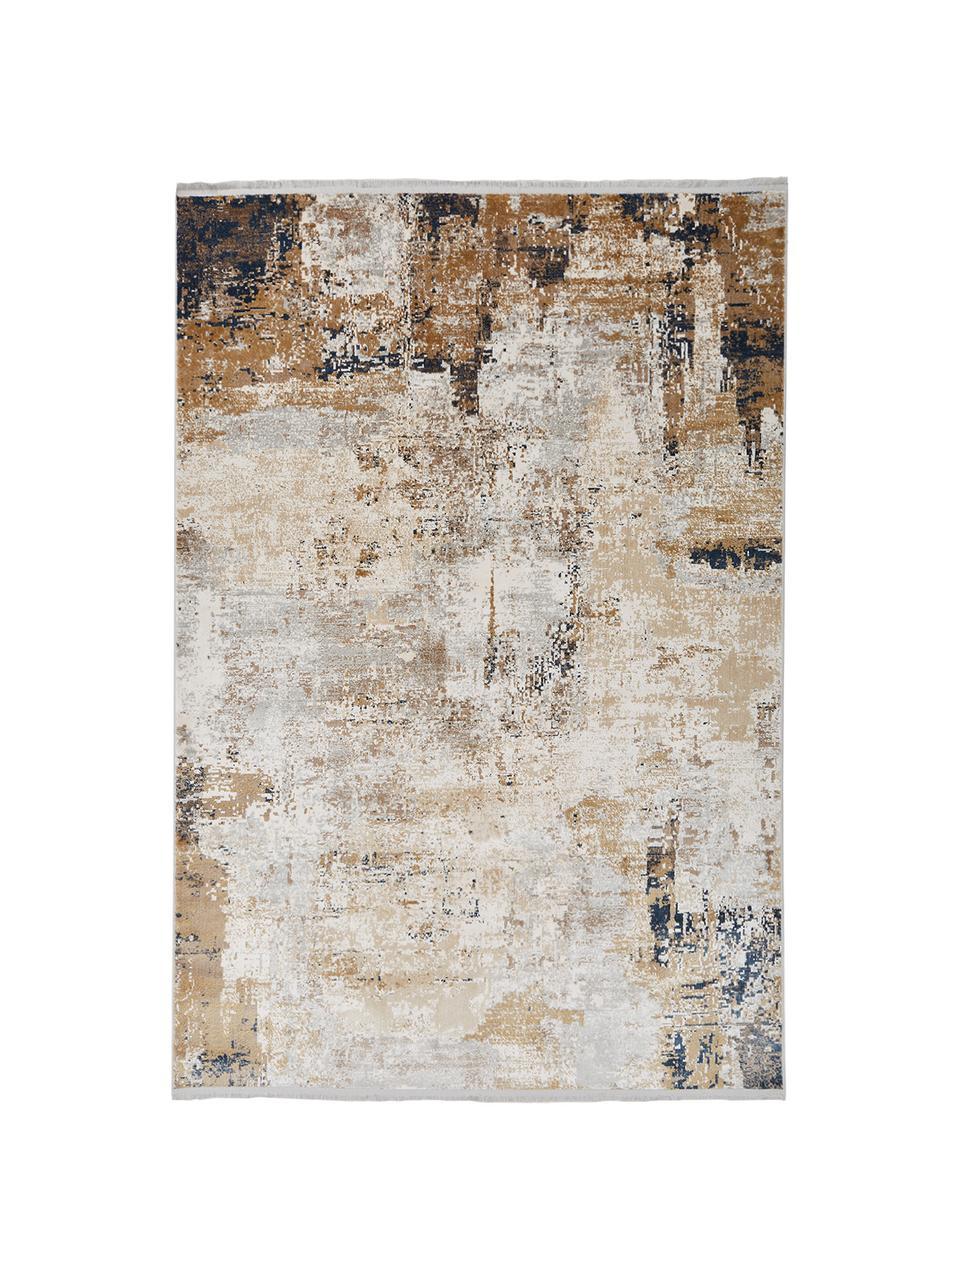 Teppich Verona mit abstraktem Muster, Flor: 50% Viskose, 50% Acryl, Creme, Beige, Grau, Braun, Dunkelblau, B 160 x L 230 cm (Größe M)